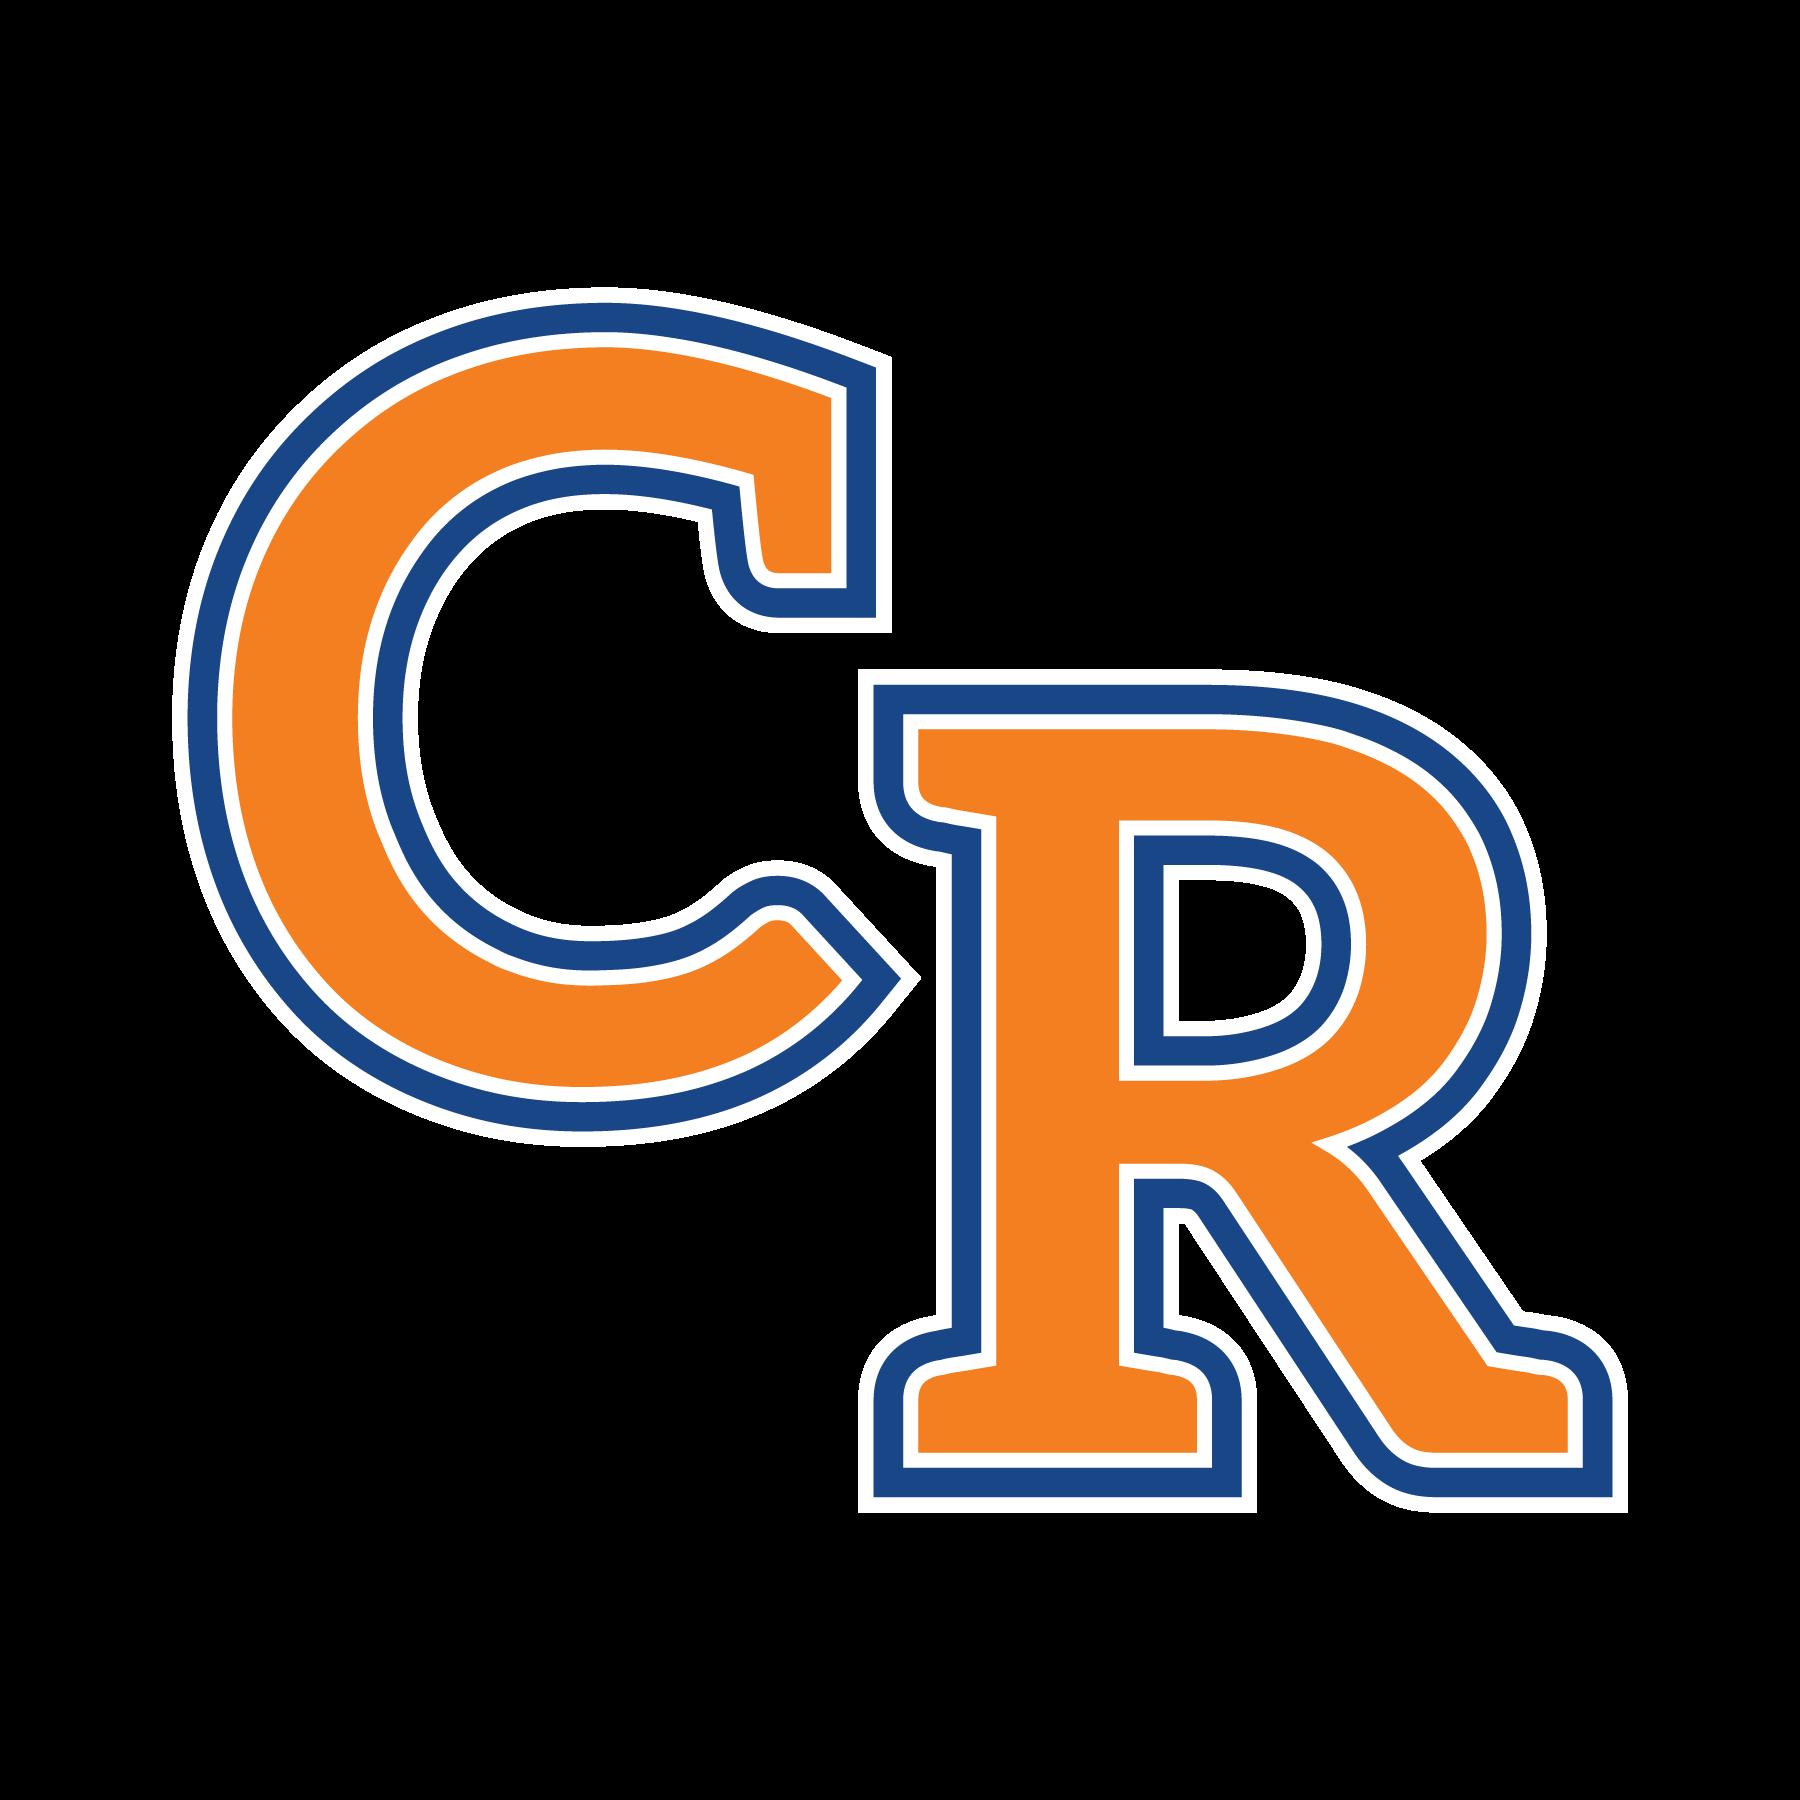 CRSD Monograms_orange_blue border.png